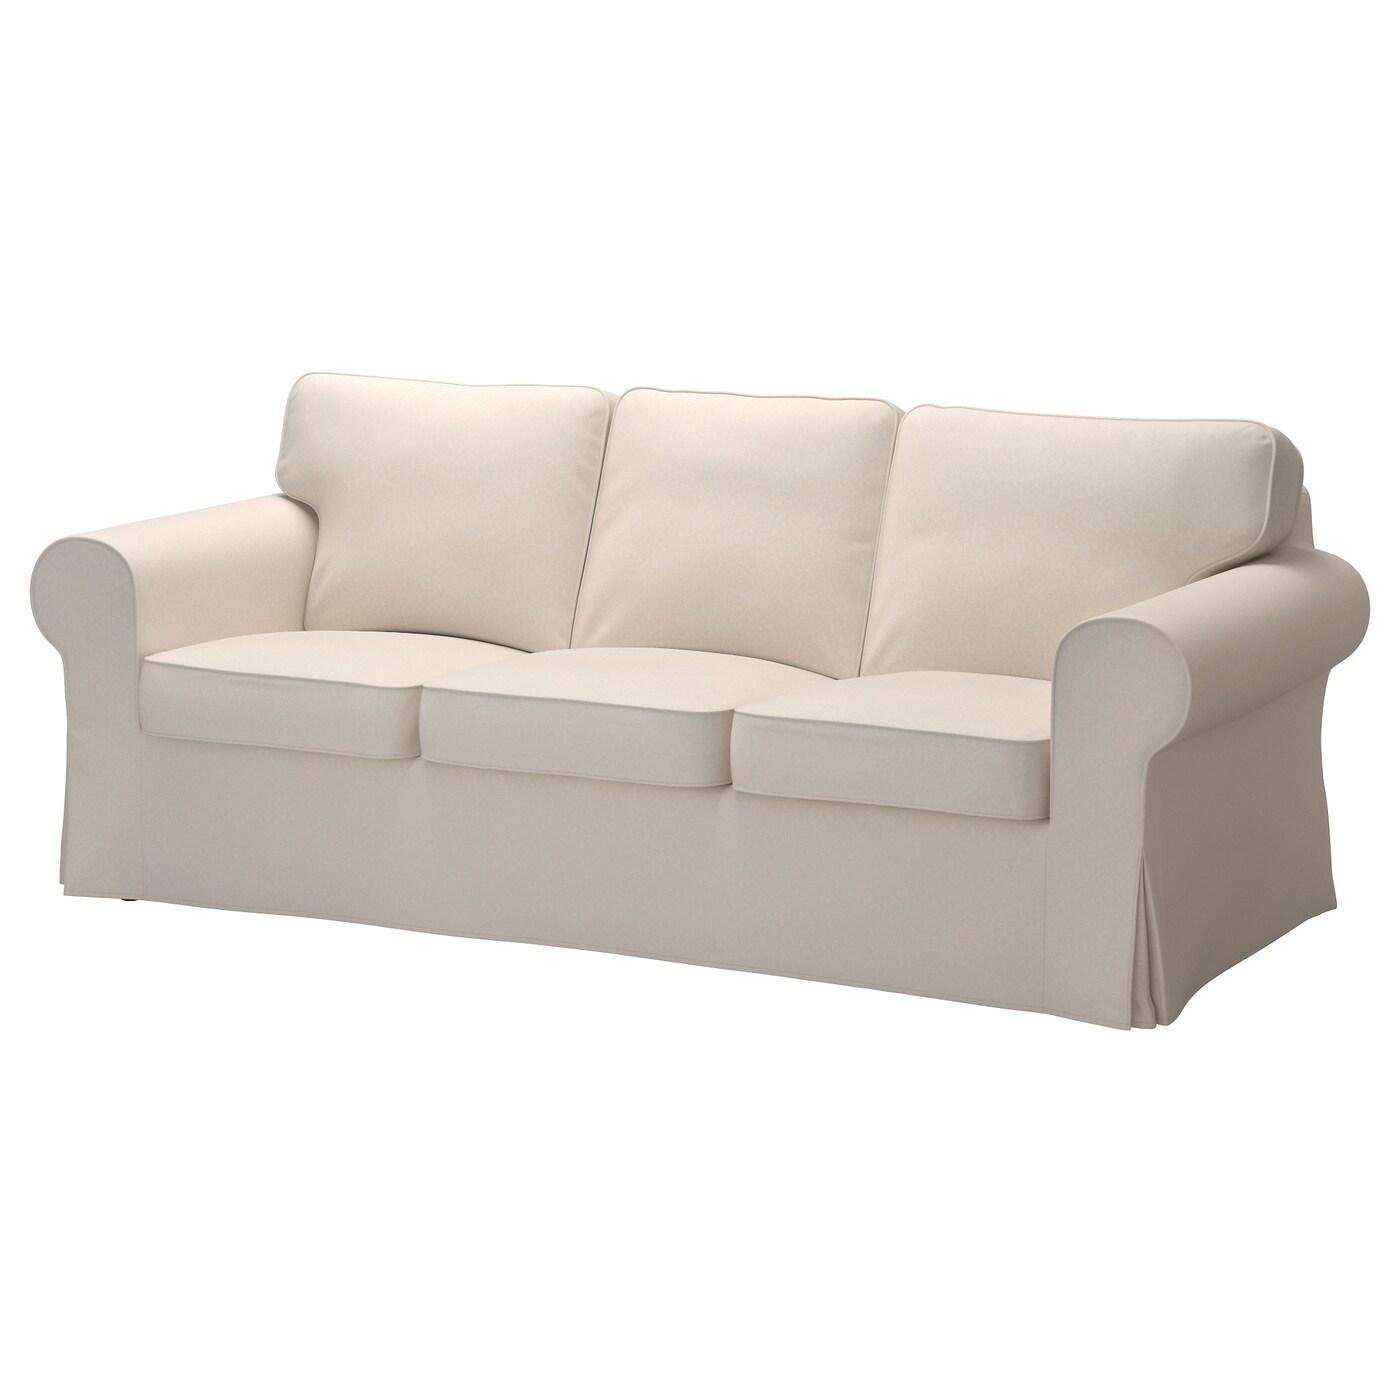 Ektorp Funda Para Sofá De 3 Plazas Lofallet Beige Ikea